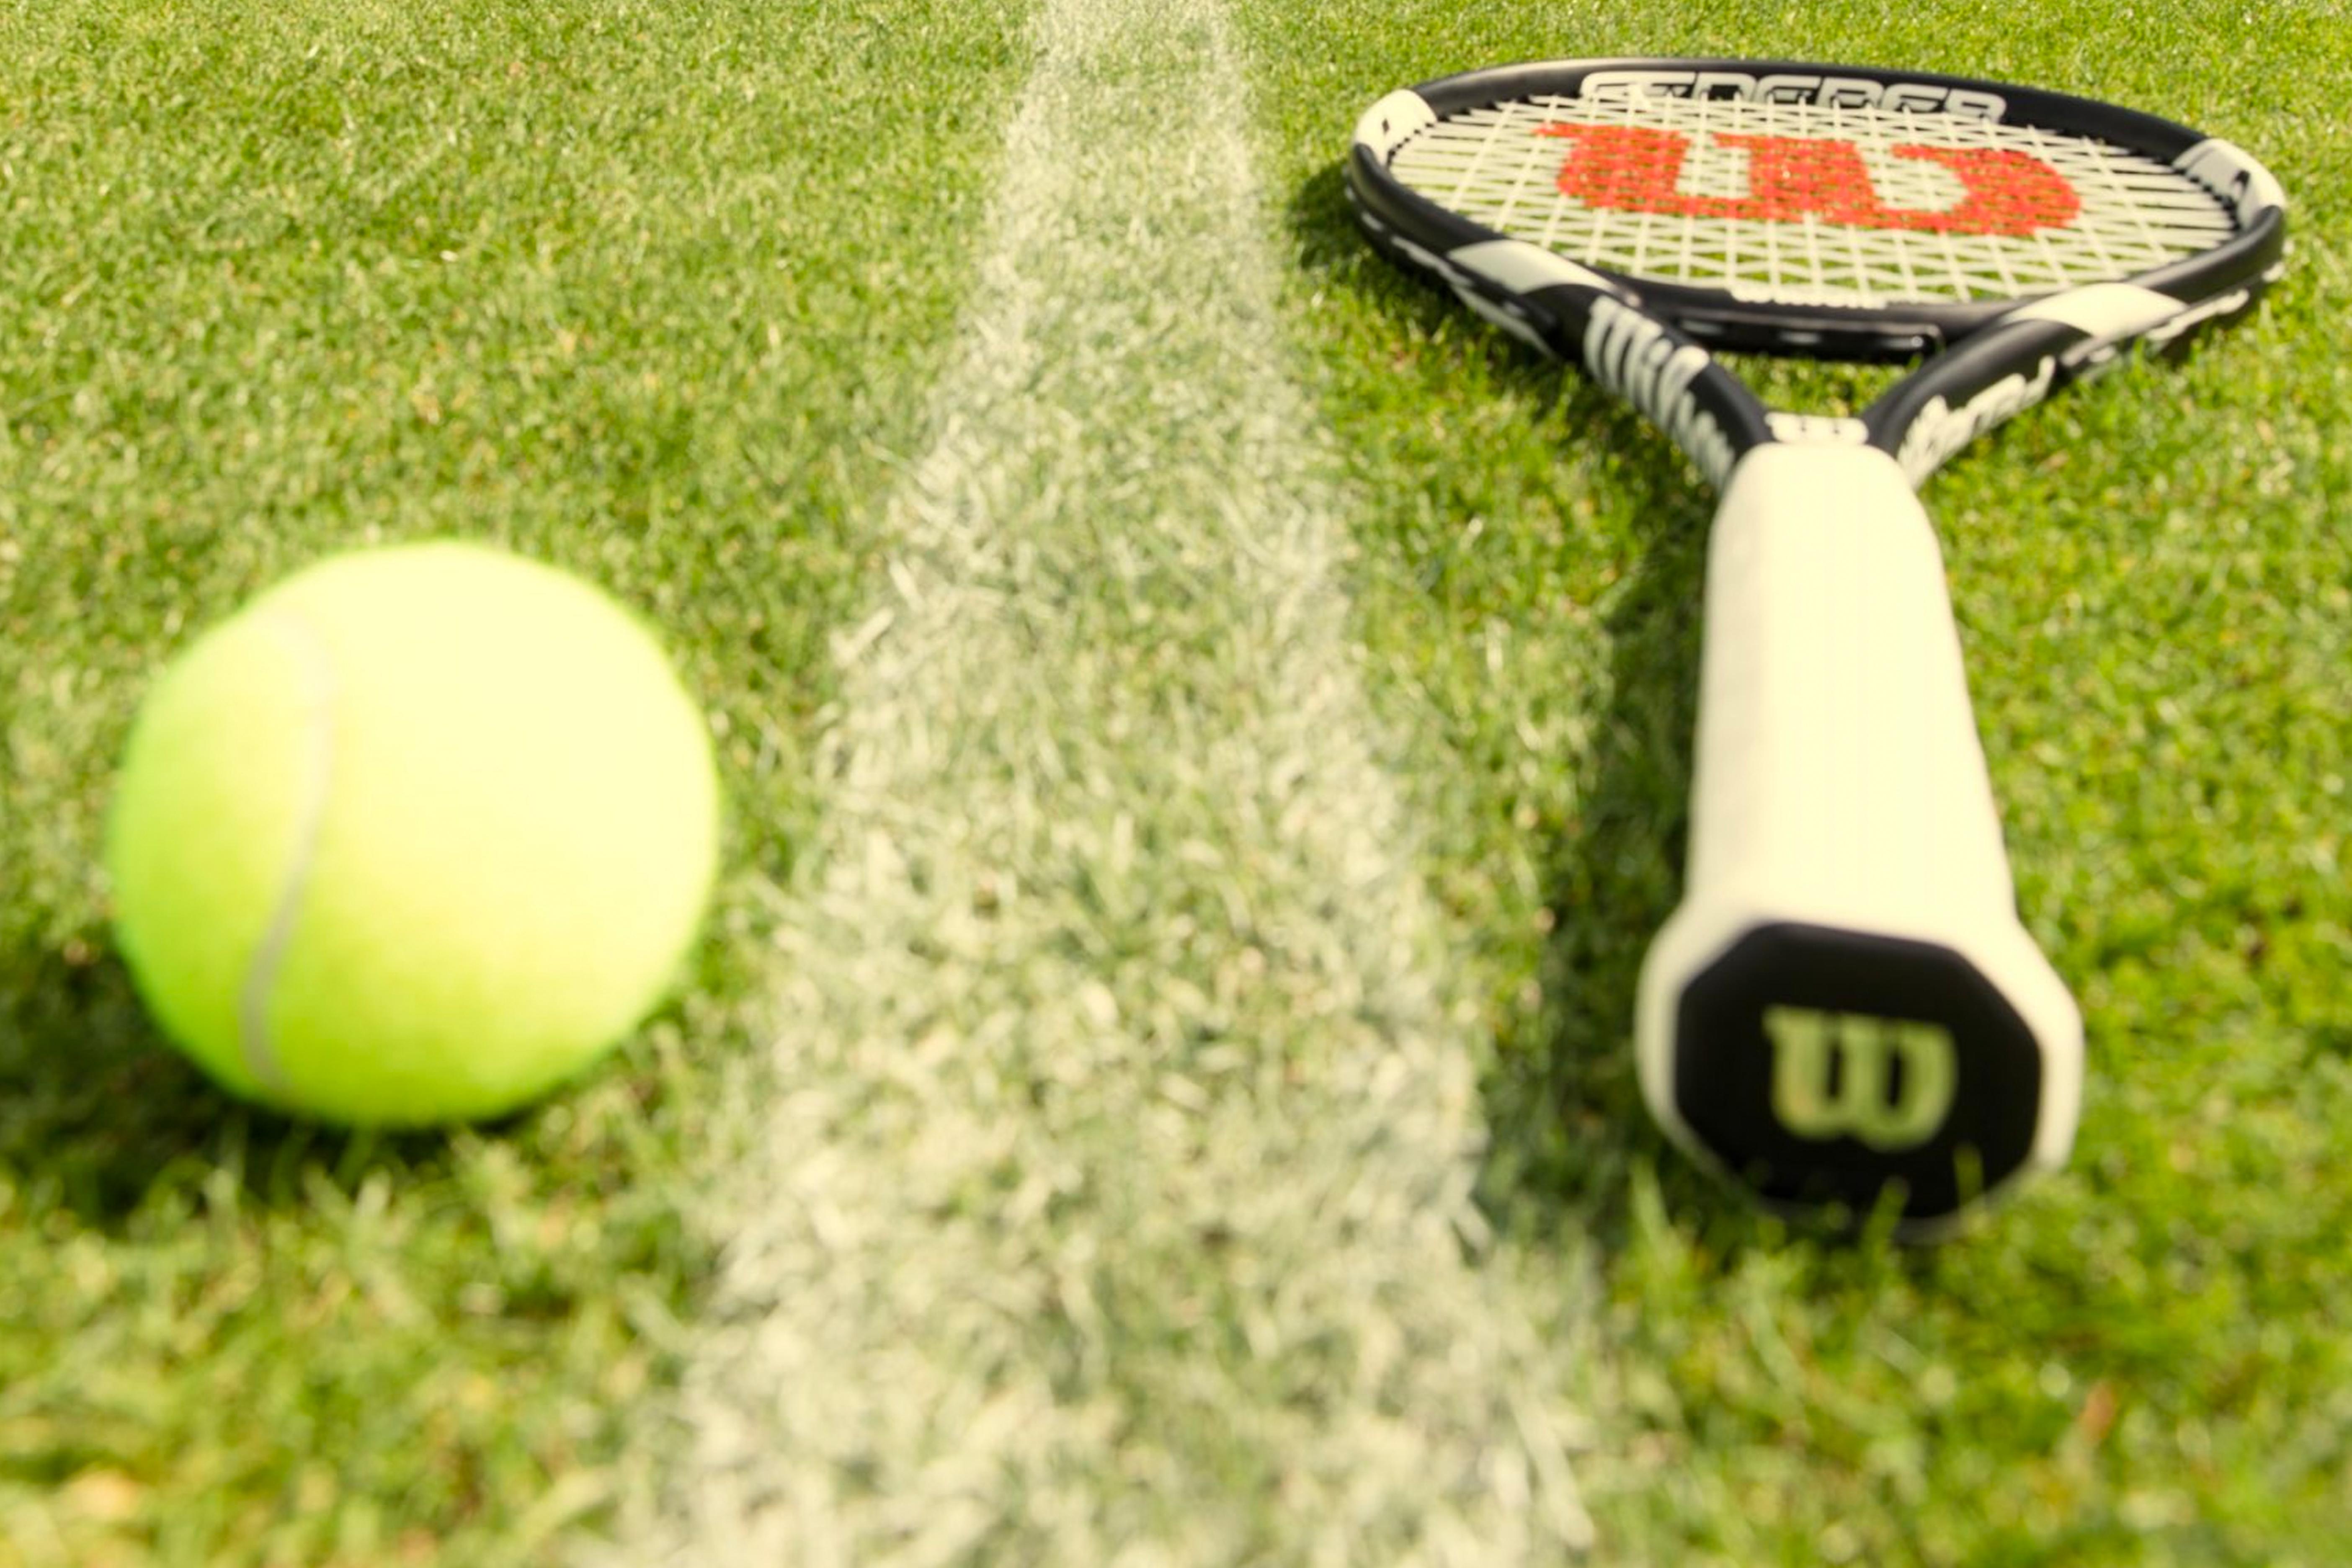 Tennis-racket-on-grass-and-bal